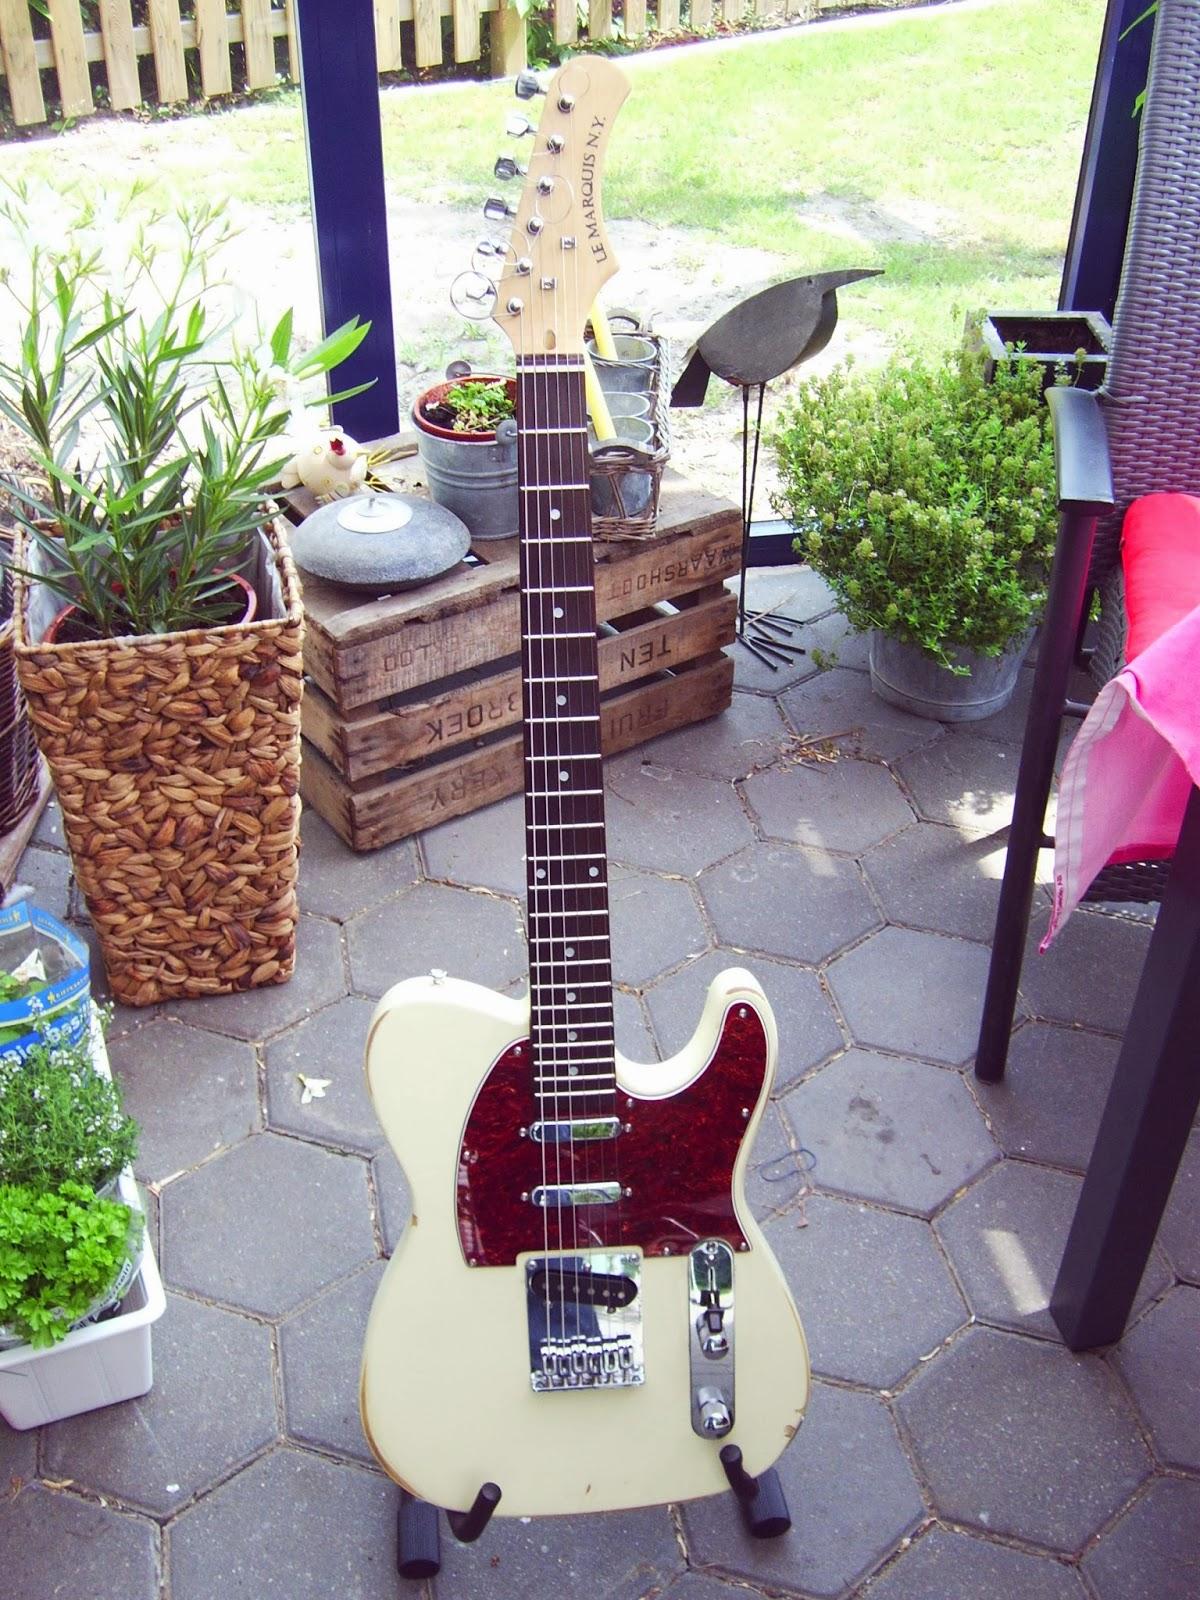 Großartig Stratocaster Schaltplan 5 Wege Schalter Fotos ...